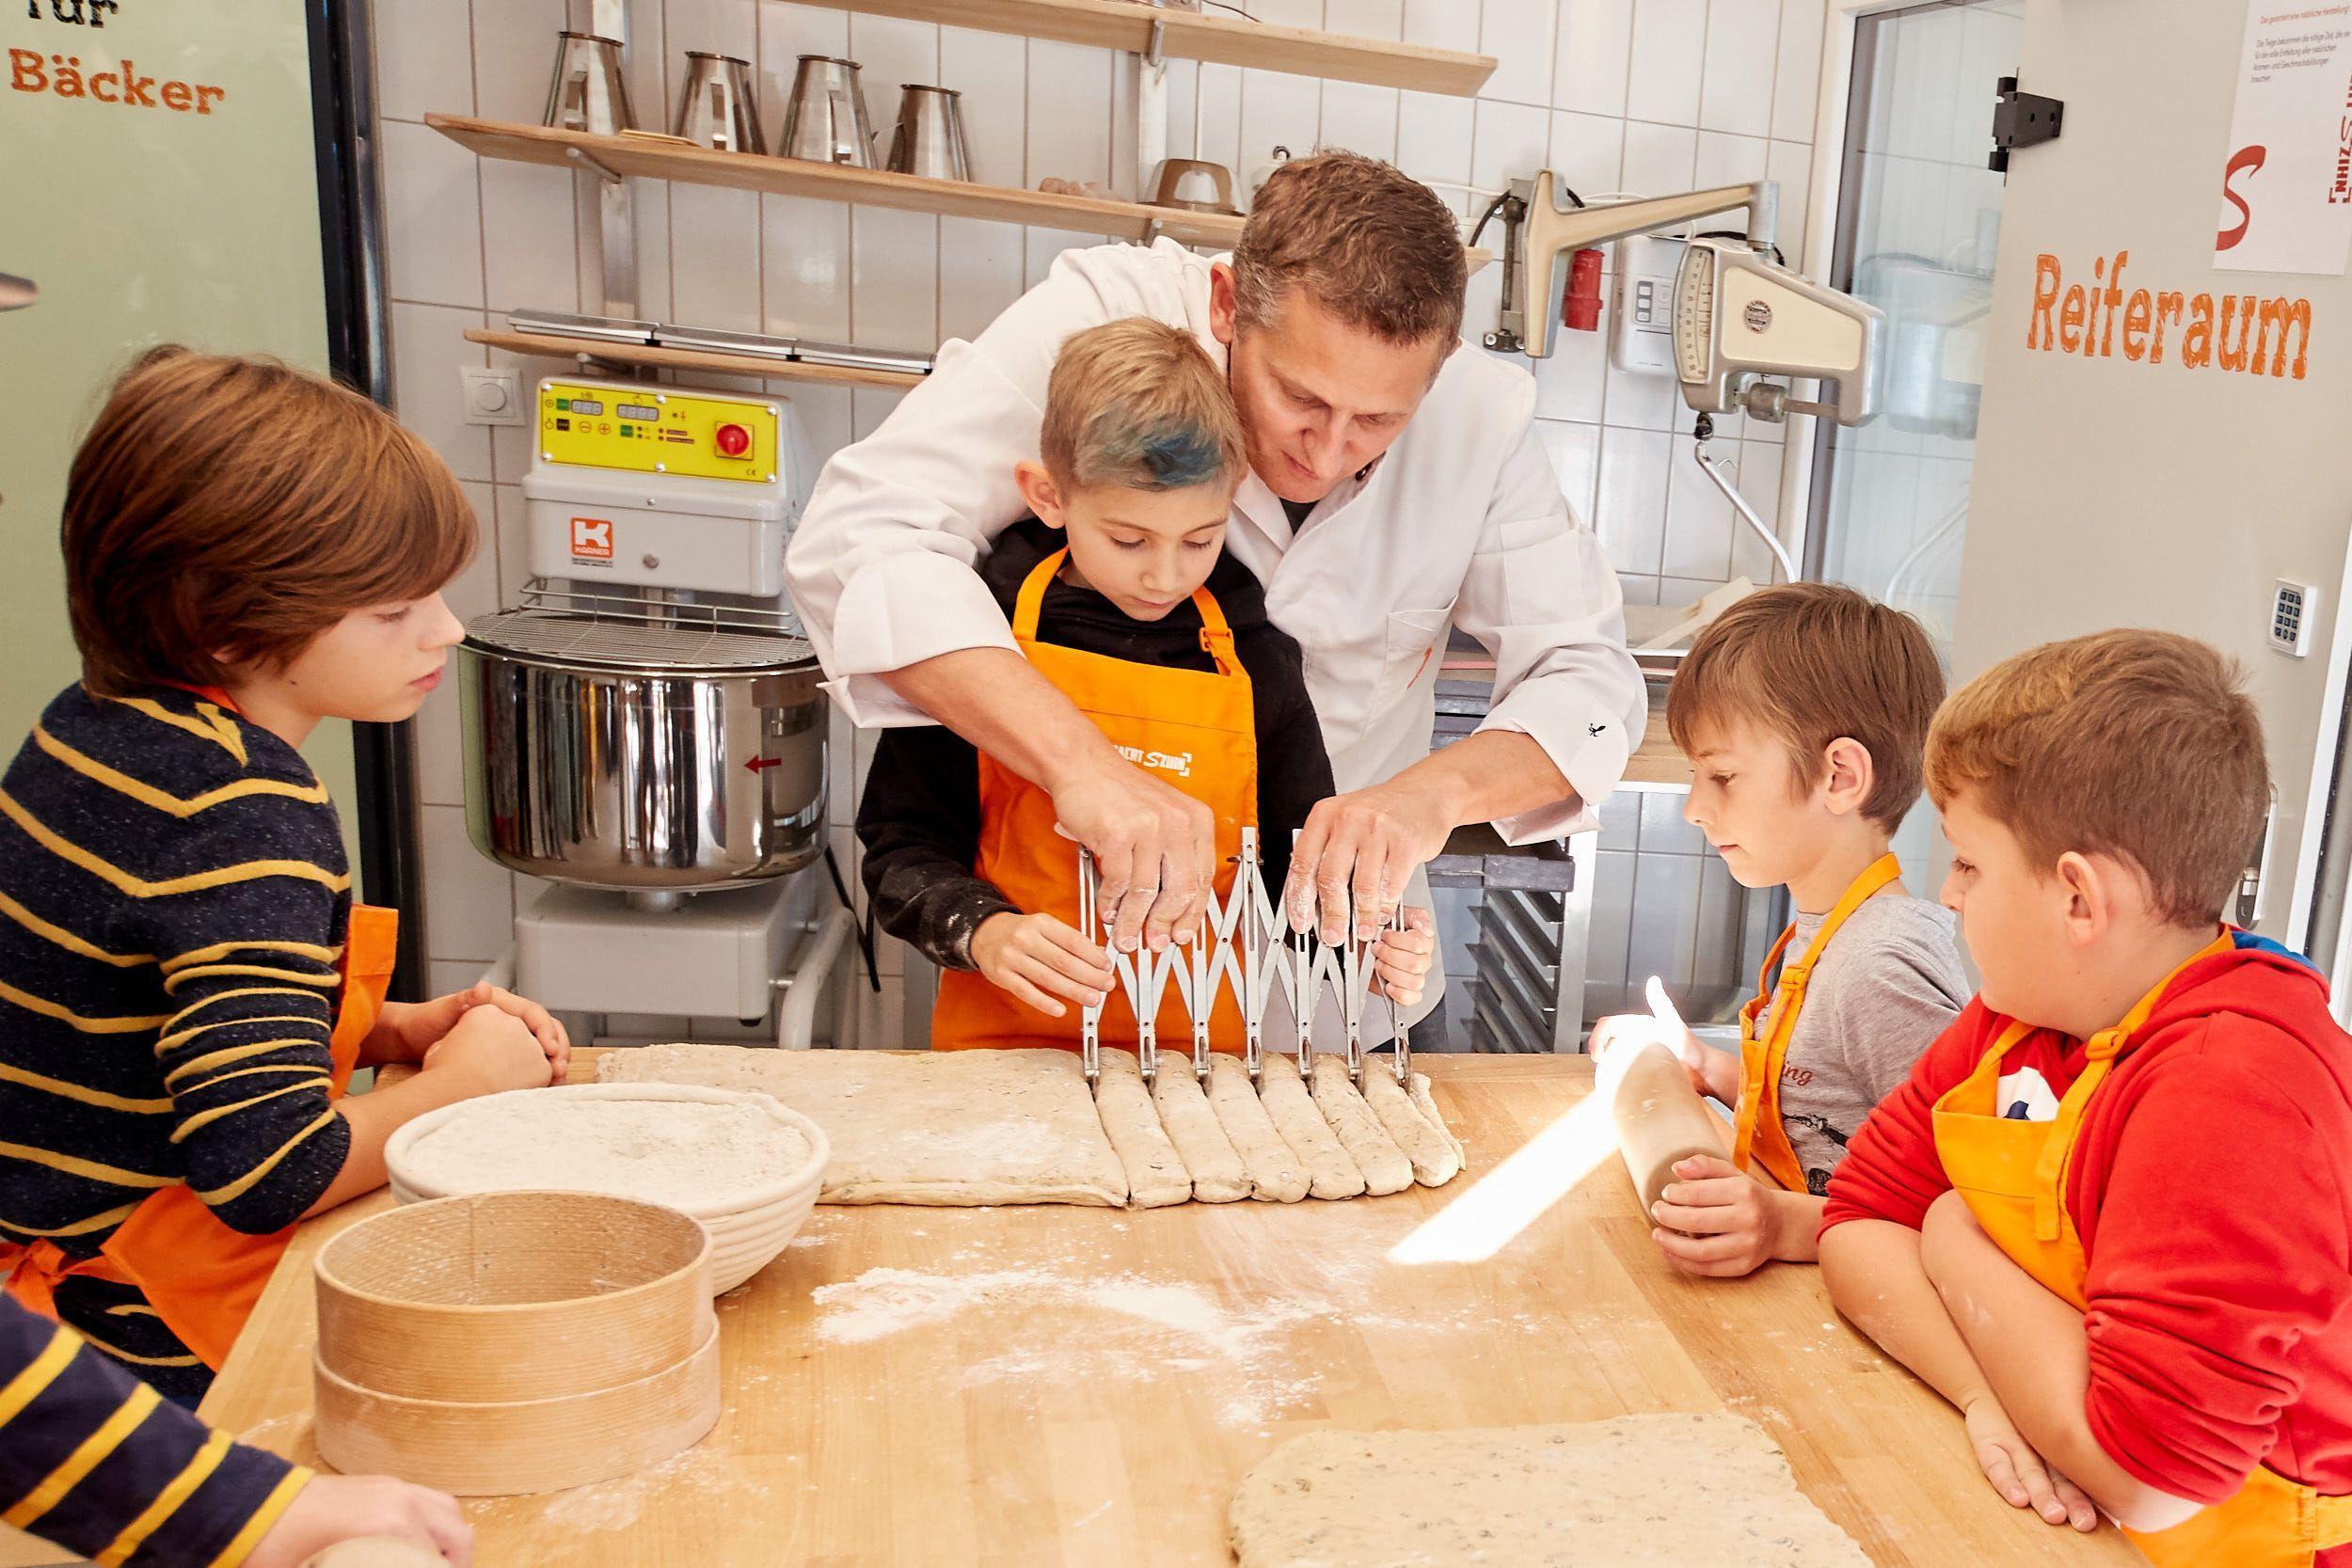 Backen mit Szihn: Wiener Traditionsbäcker unterstützt Kinder-Krebshilfe